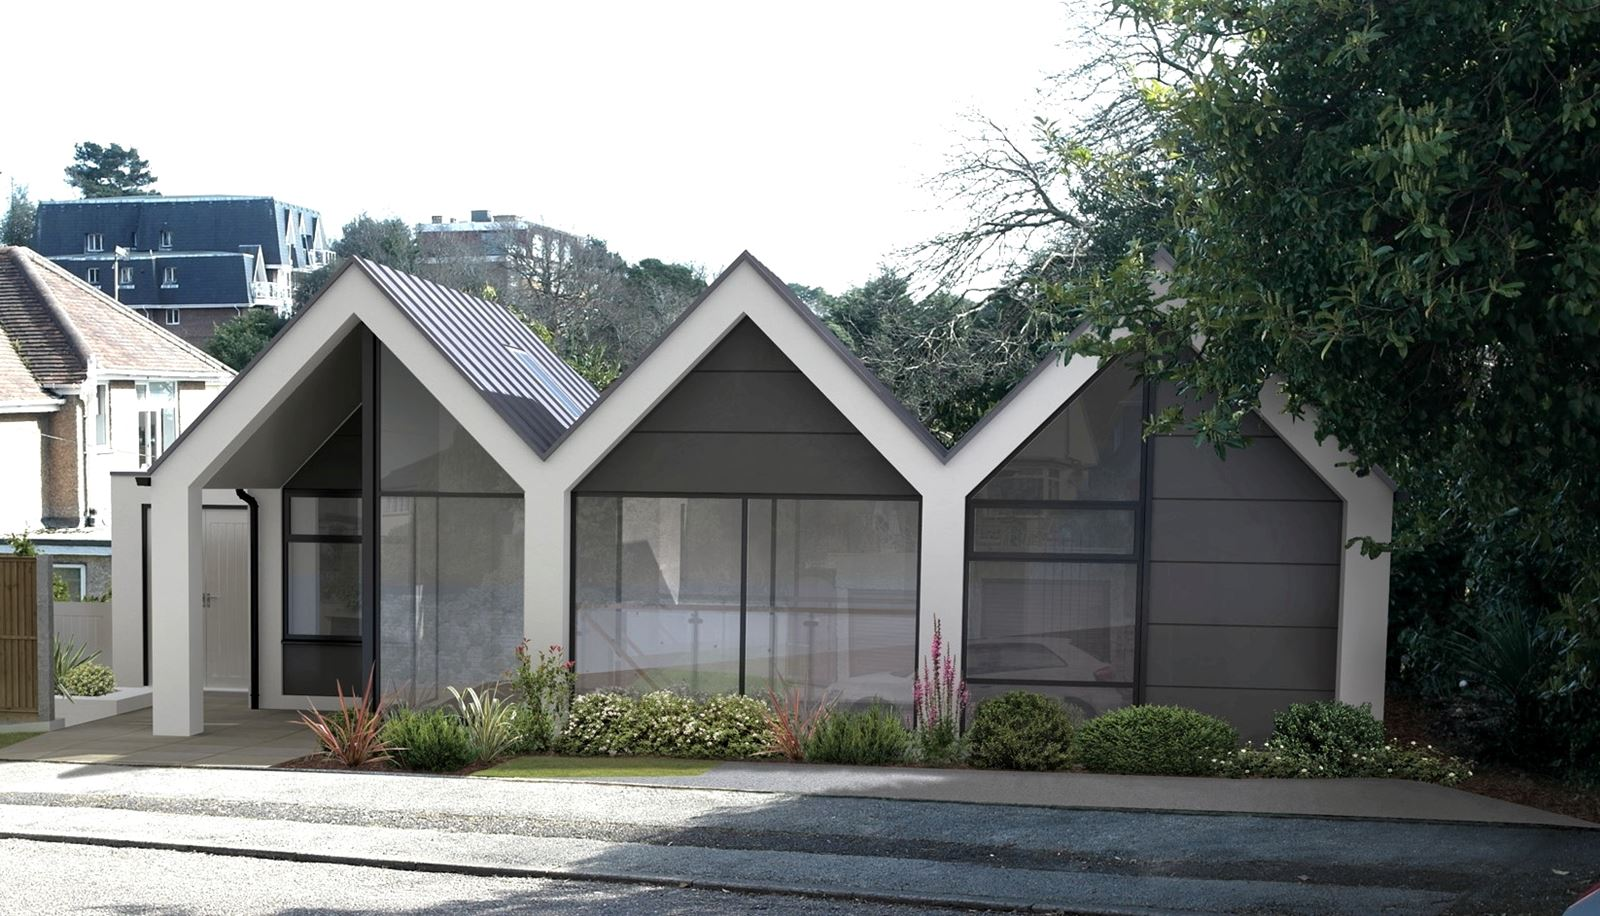 Bespoke house design by Poole architects Studio Moda